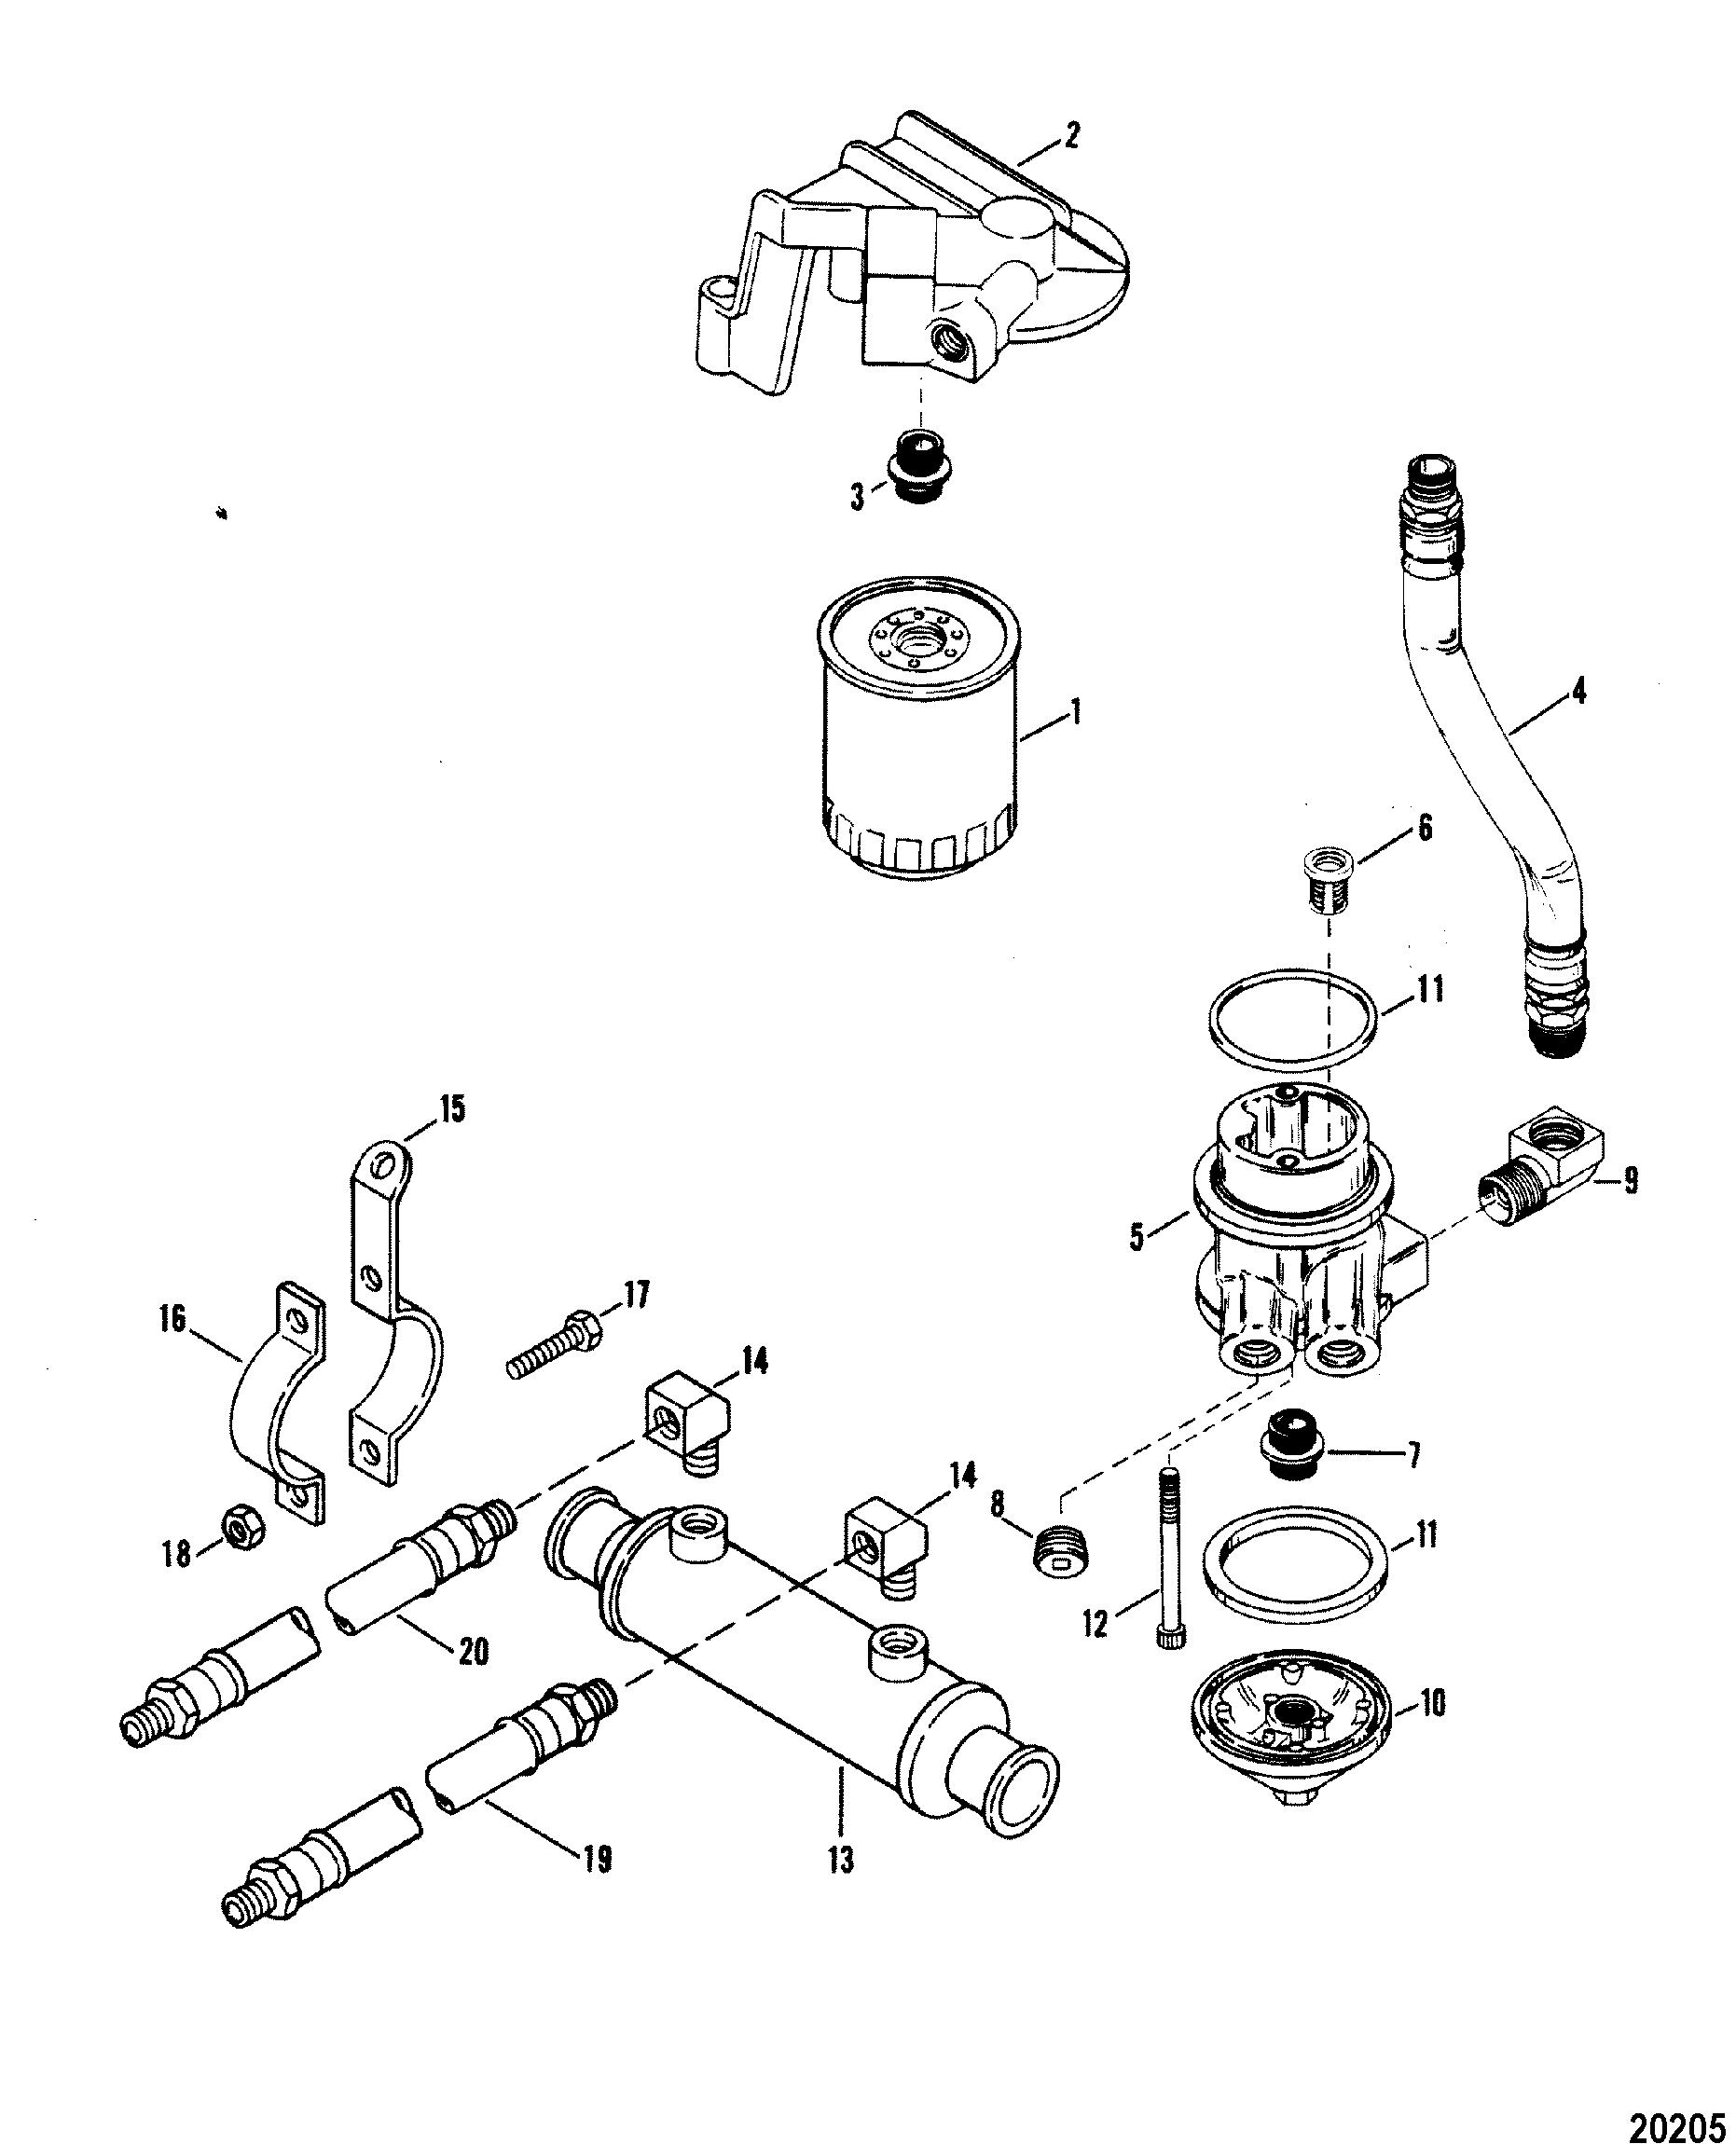 Engine section array oil filter and adapter for mercruiser 330 h p engine w borg warner rh jamestowndistributors